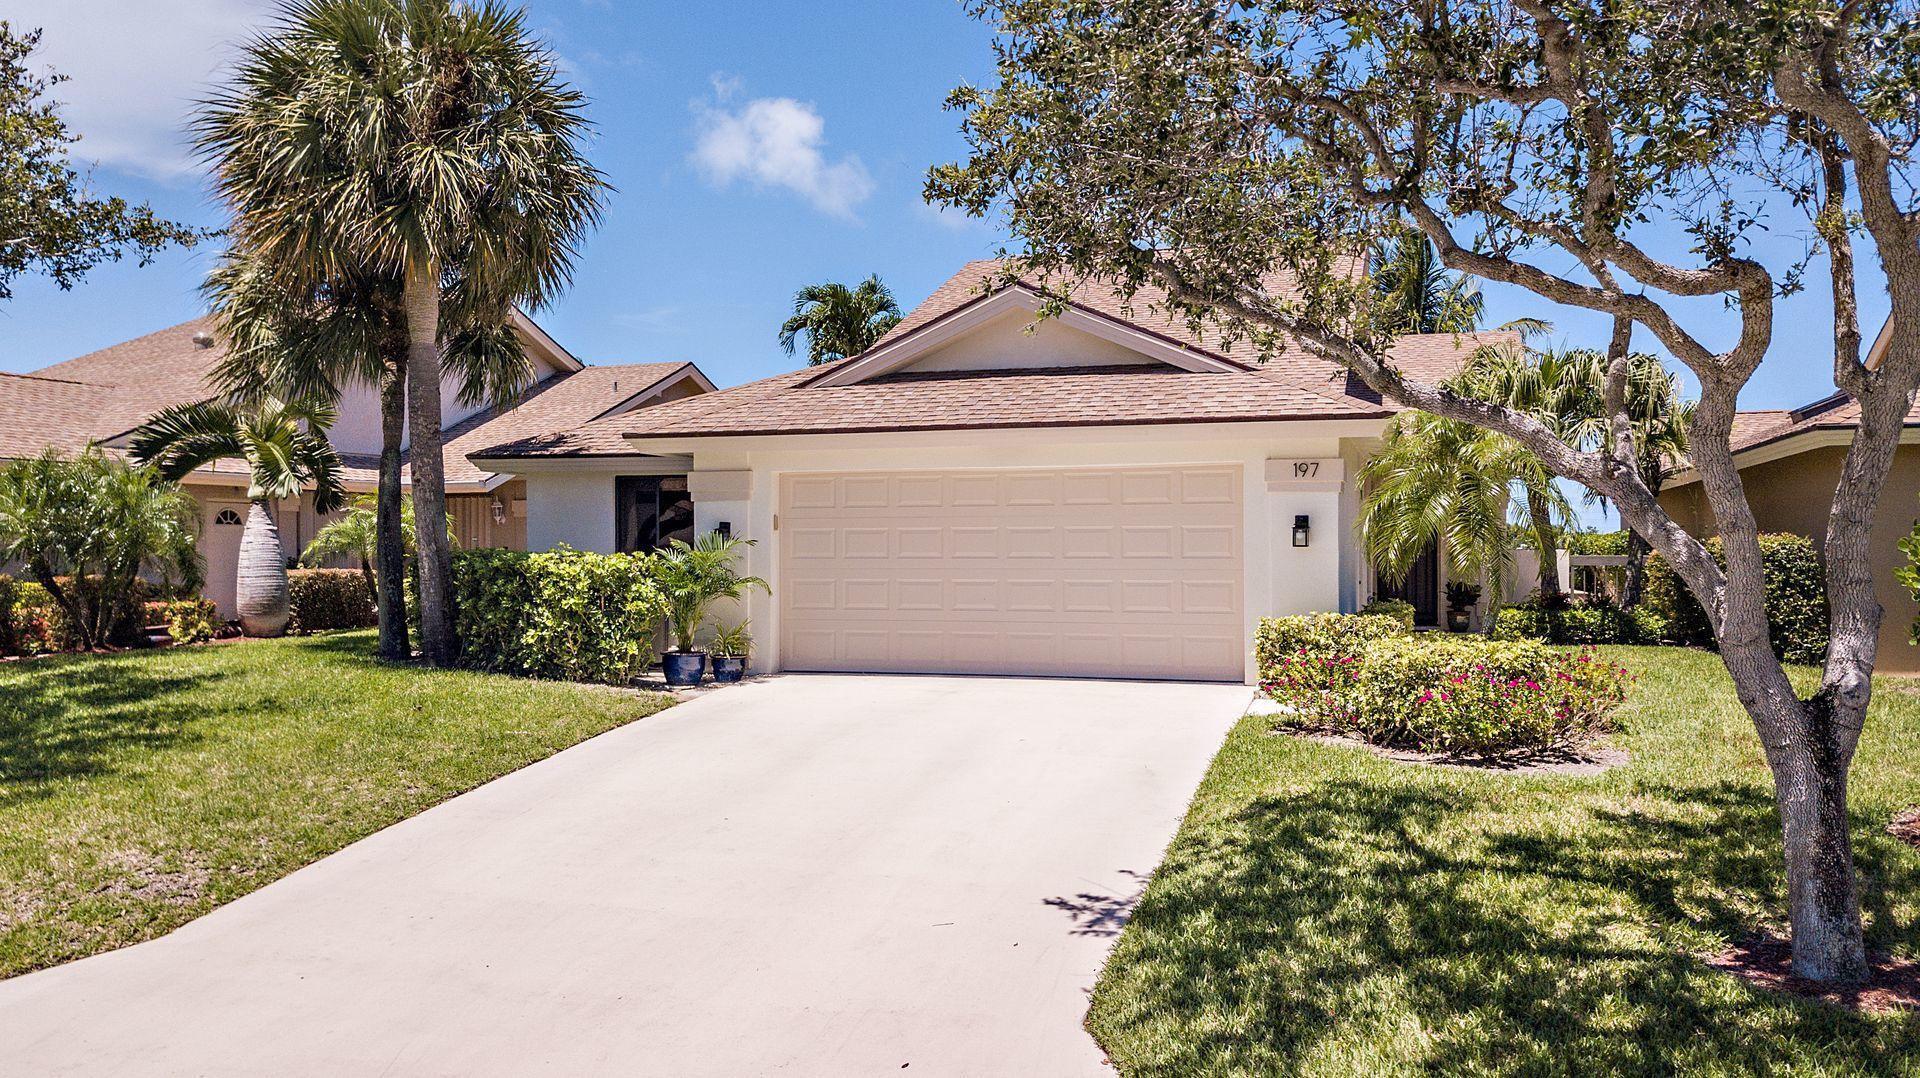 197  Ridge Road  For Sale 10732833, FL